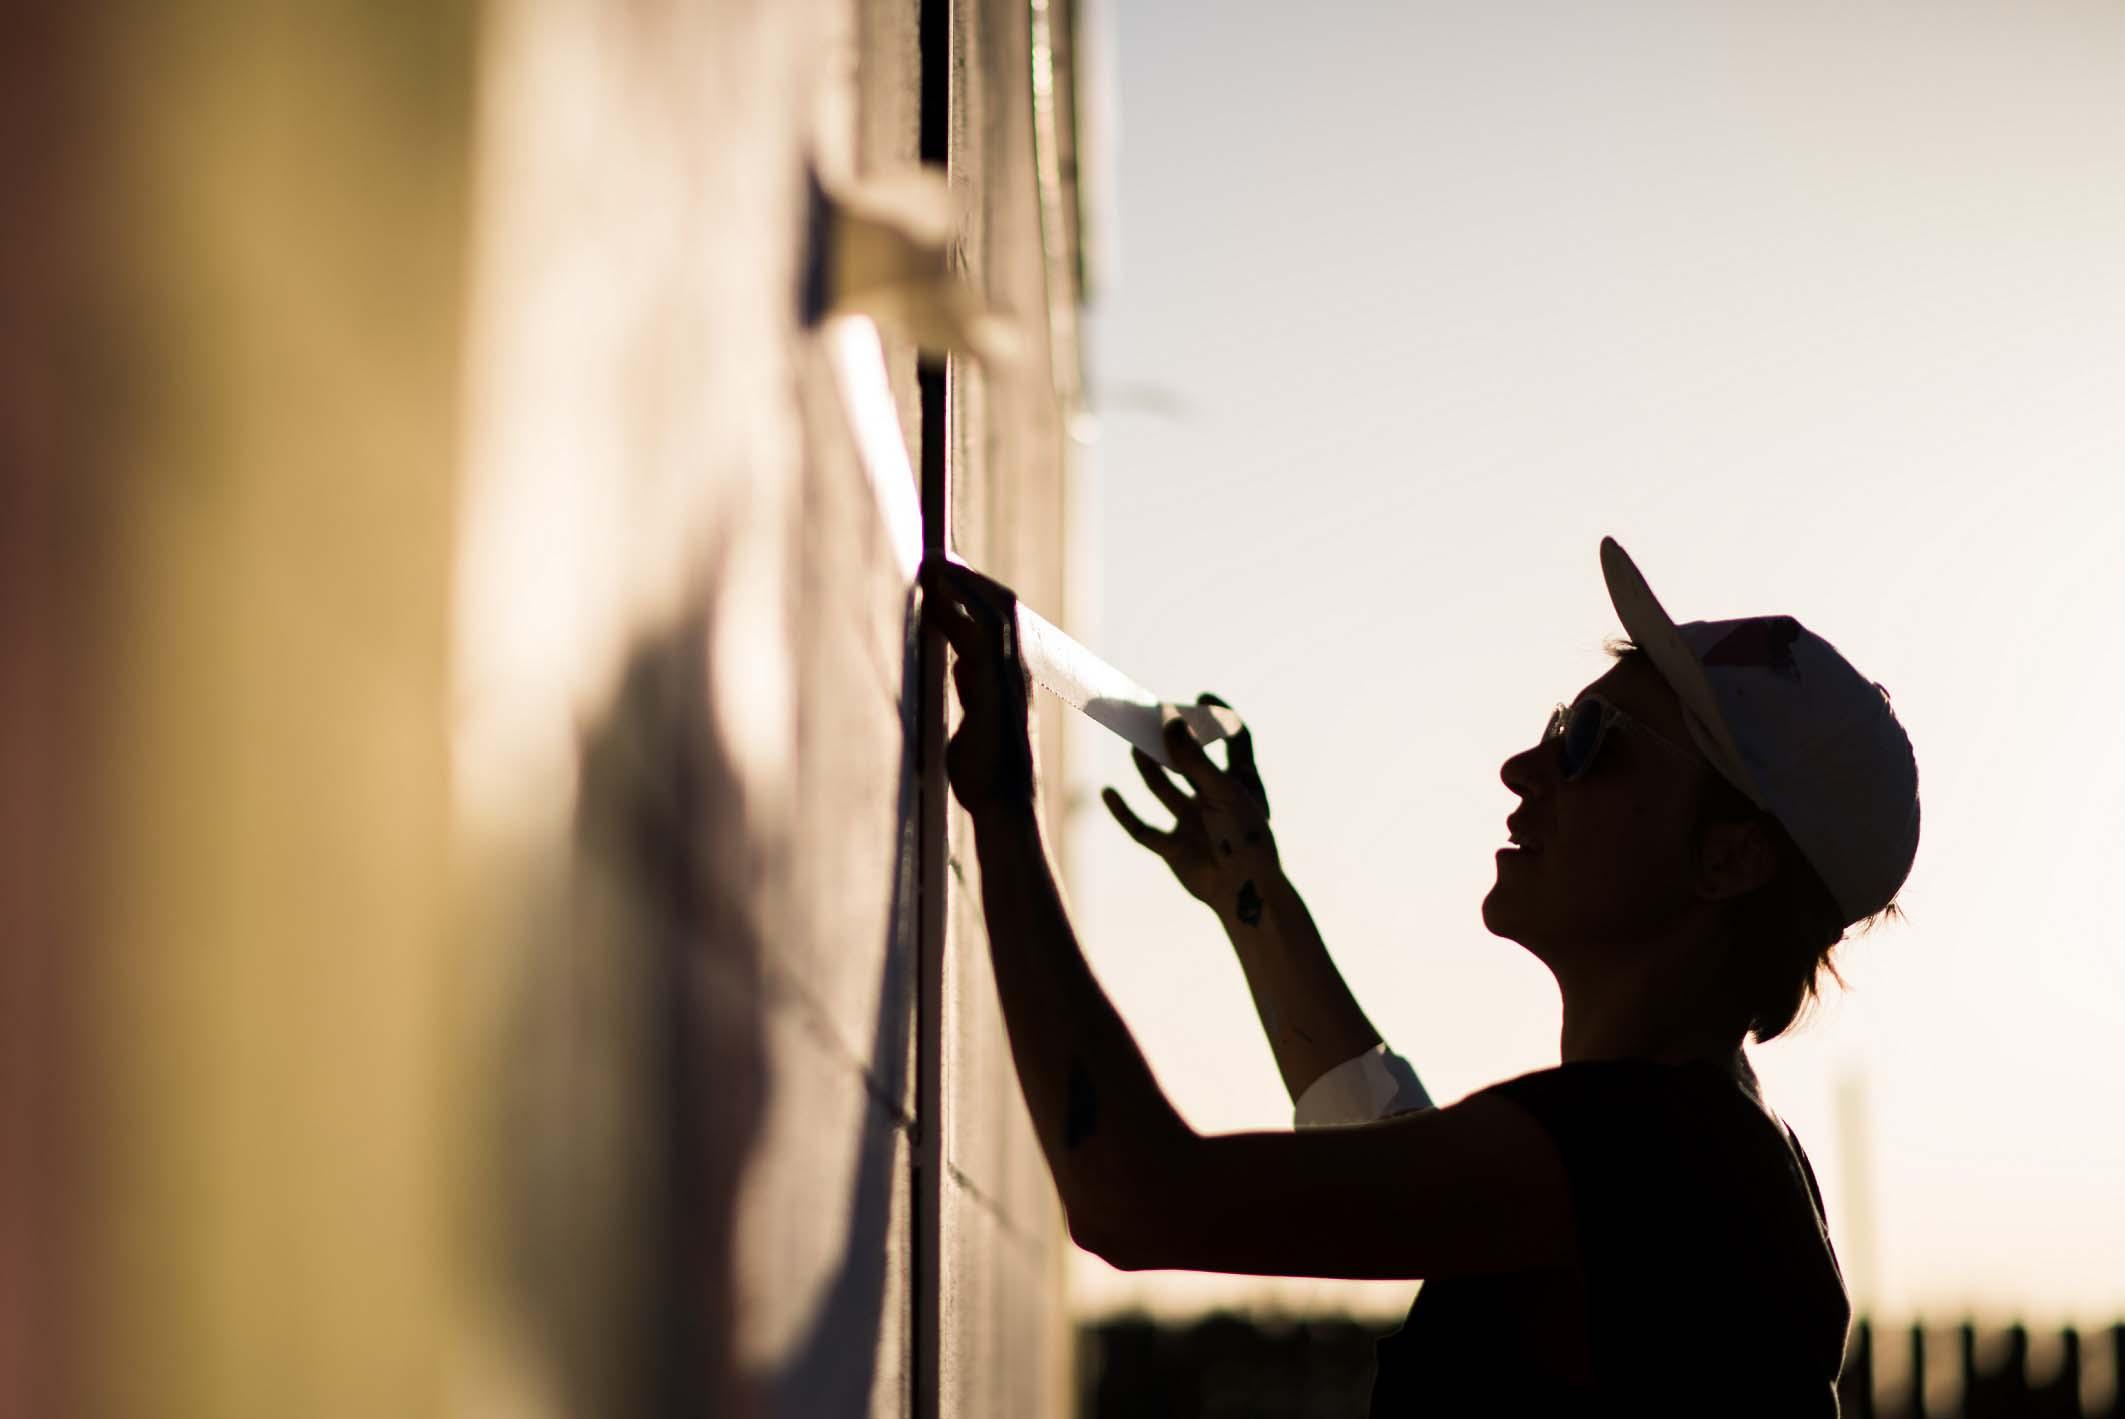 Taller de muralismo con Anna Taratiel